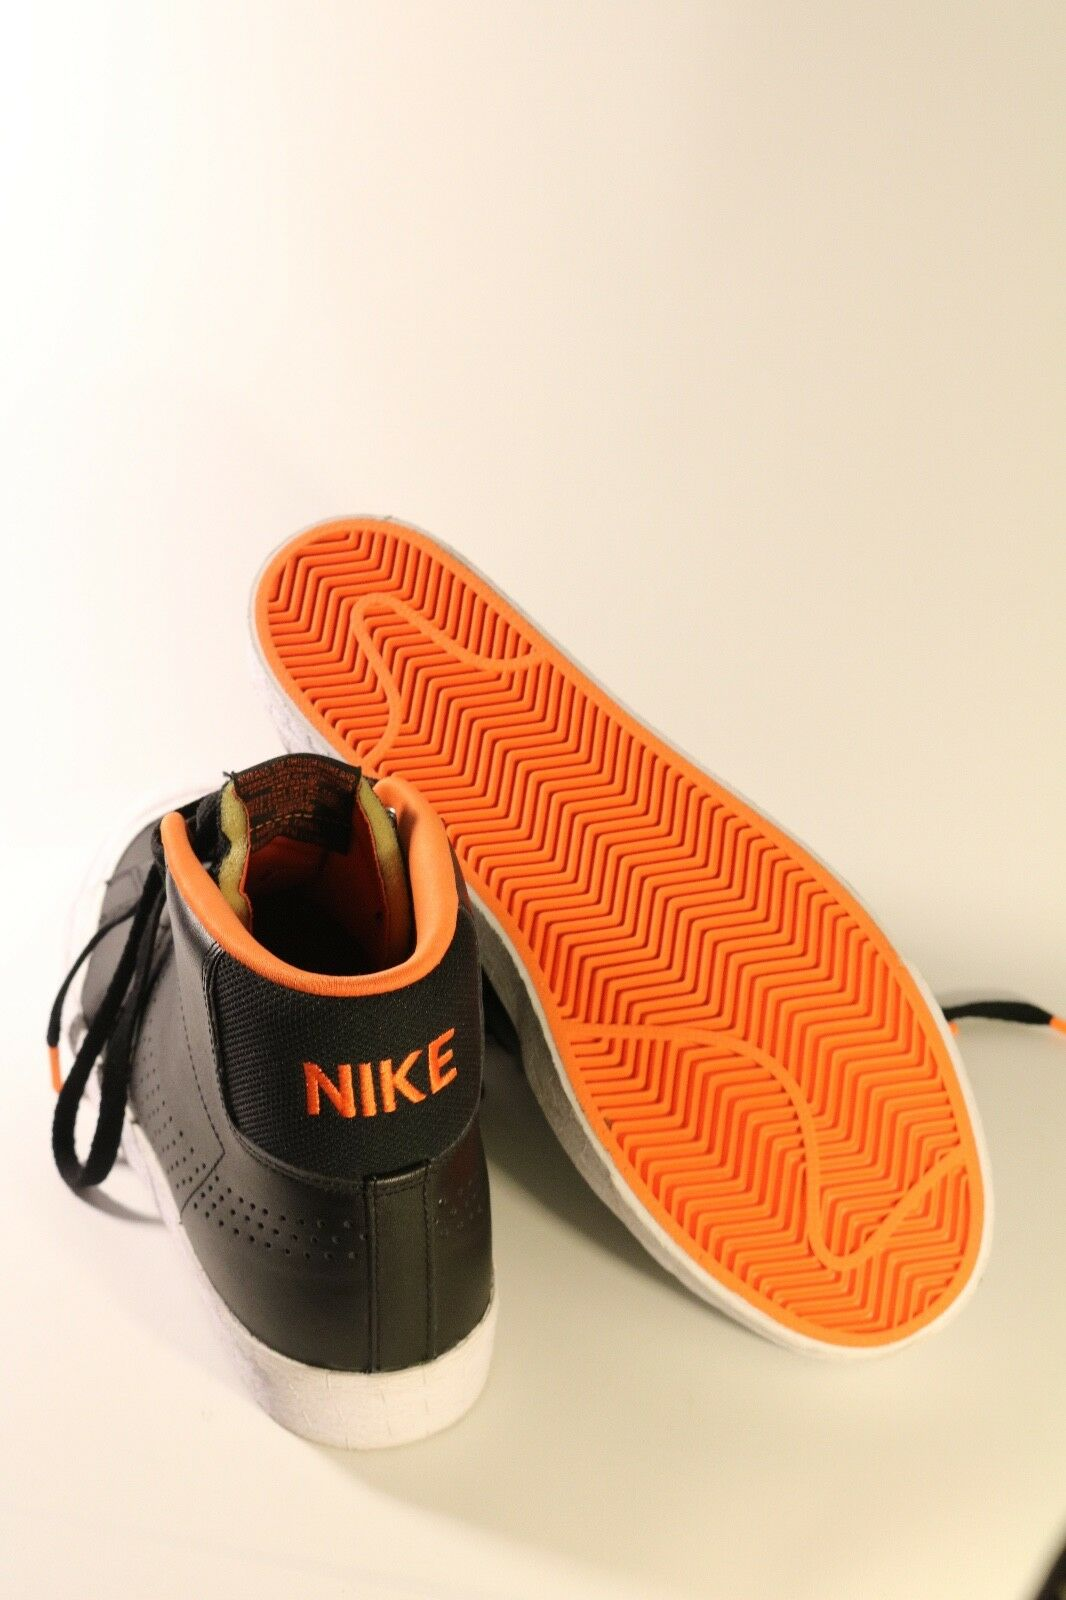 Nike SB blazers black high-top sneakers Men's size 10.5 Brand New